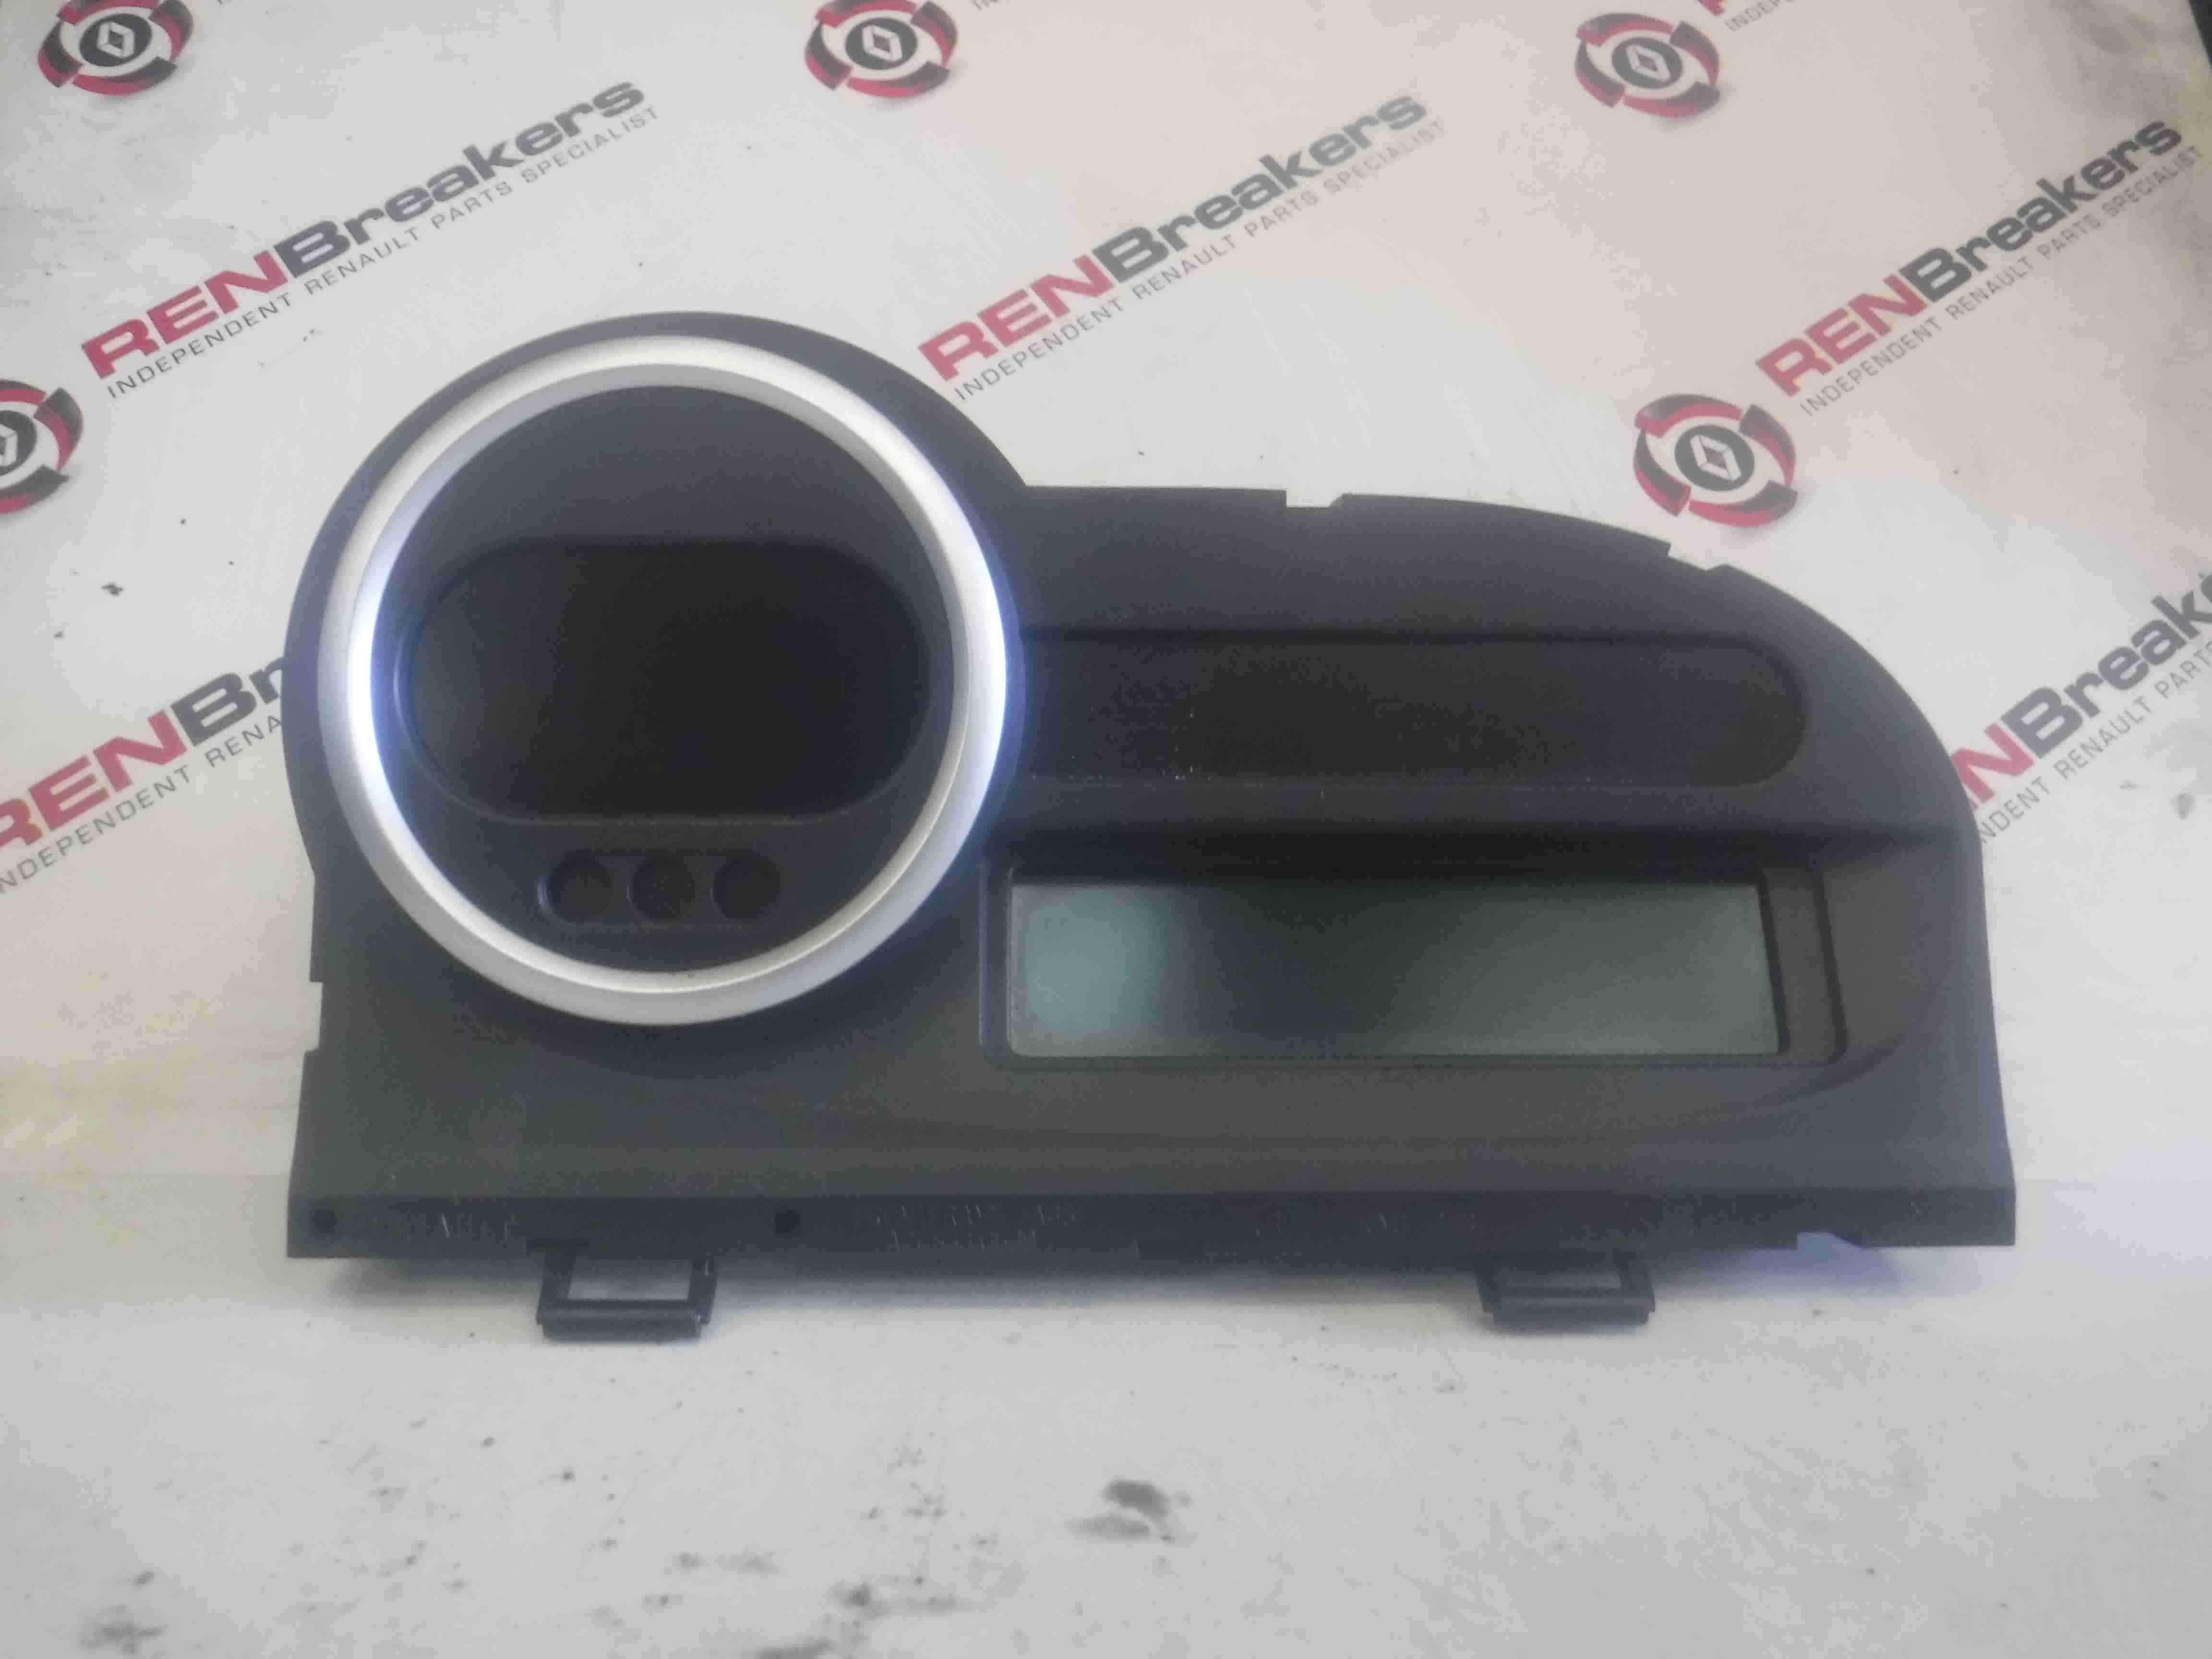 Renault Twingo 2011-2014 Instrument Panel Dials Clocks Speedo 280345731r